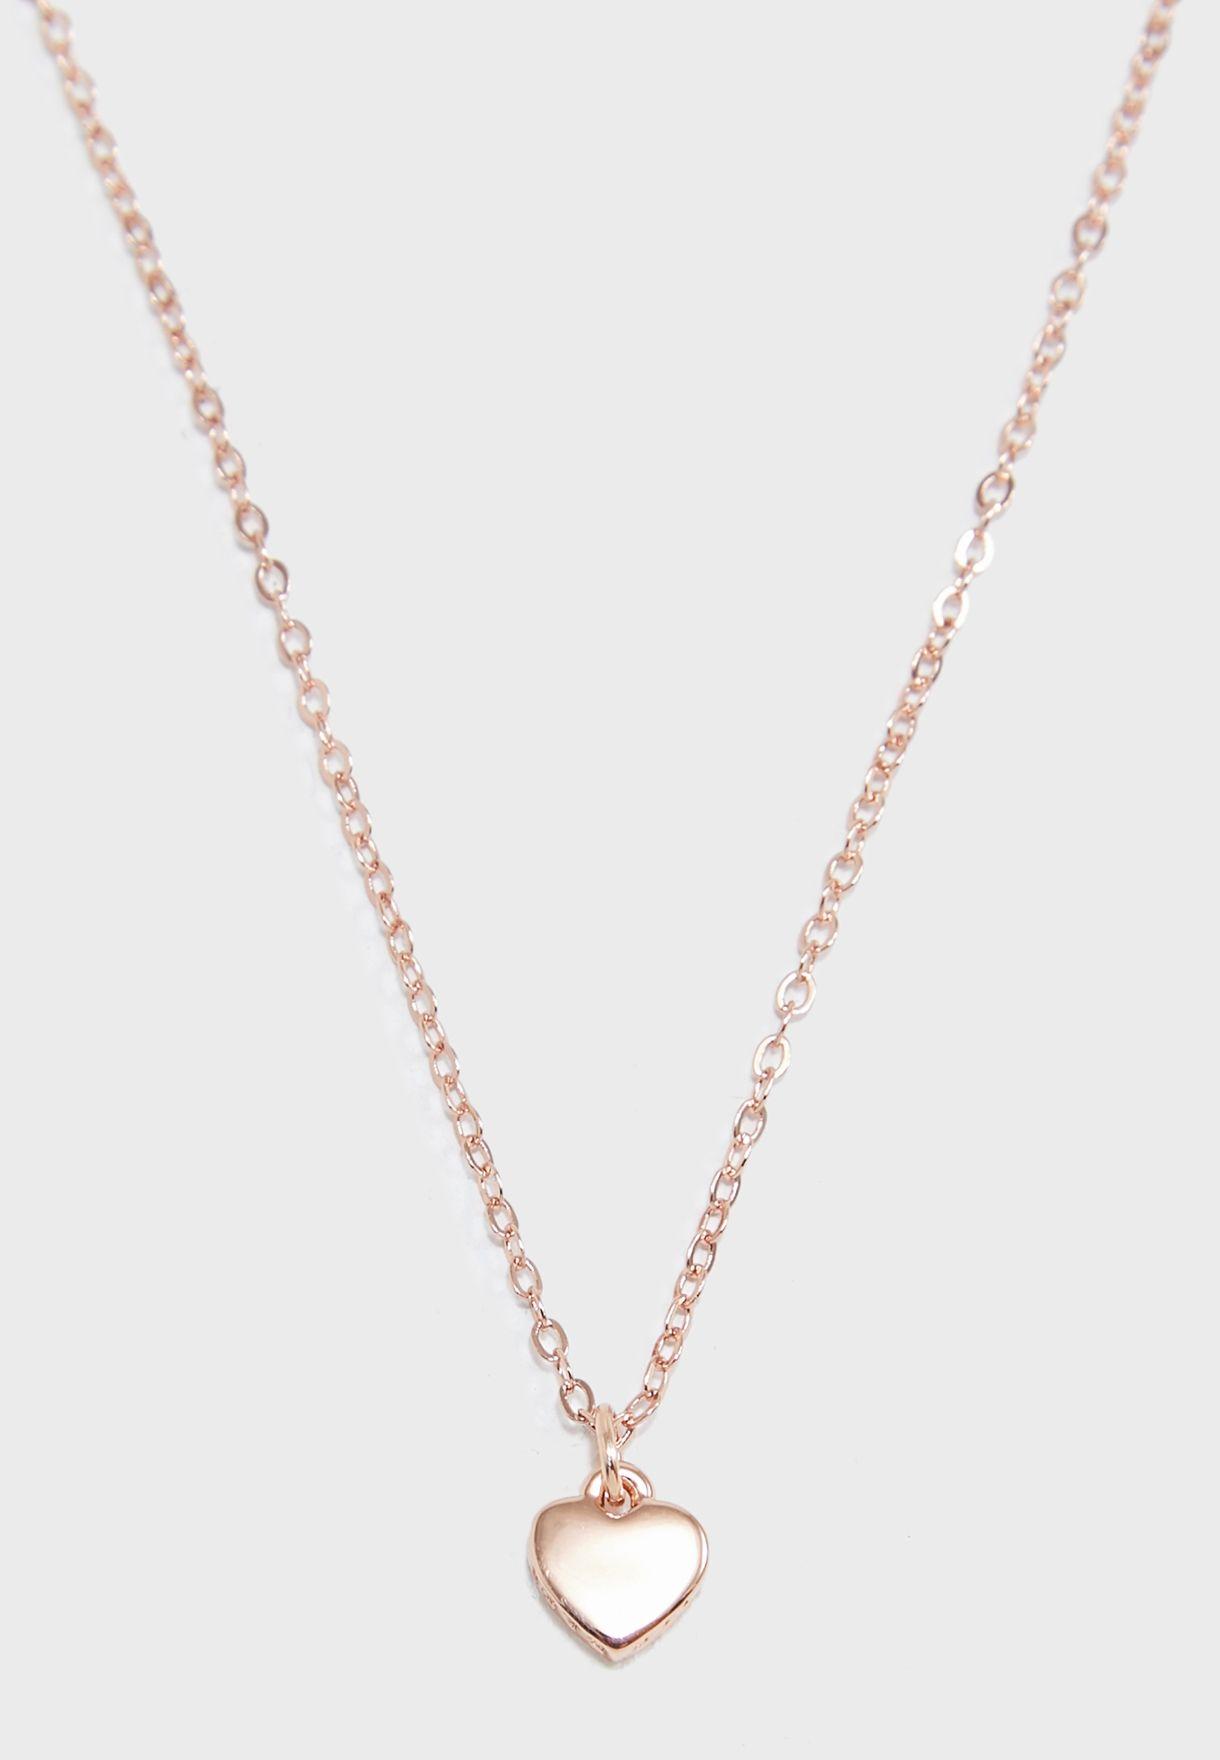 7b75ff8ebcc1 Shop Ted baker rosegold Hara Tiny Heart Pendant Necklace TBJ1145-24 ...